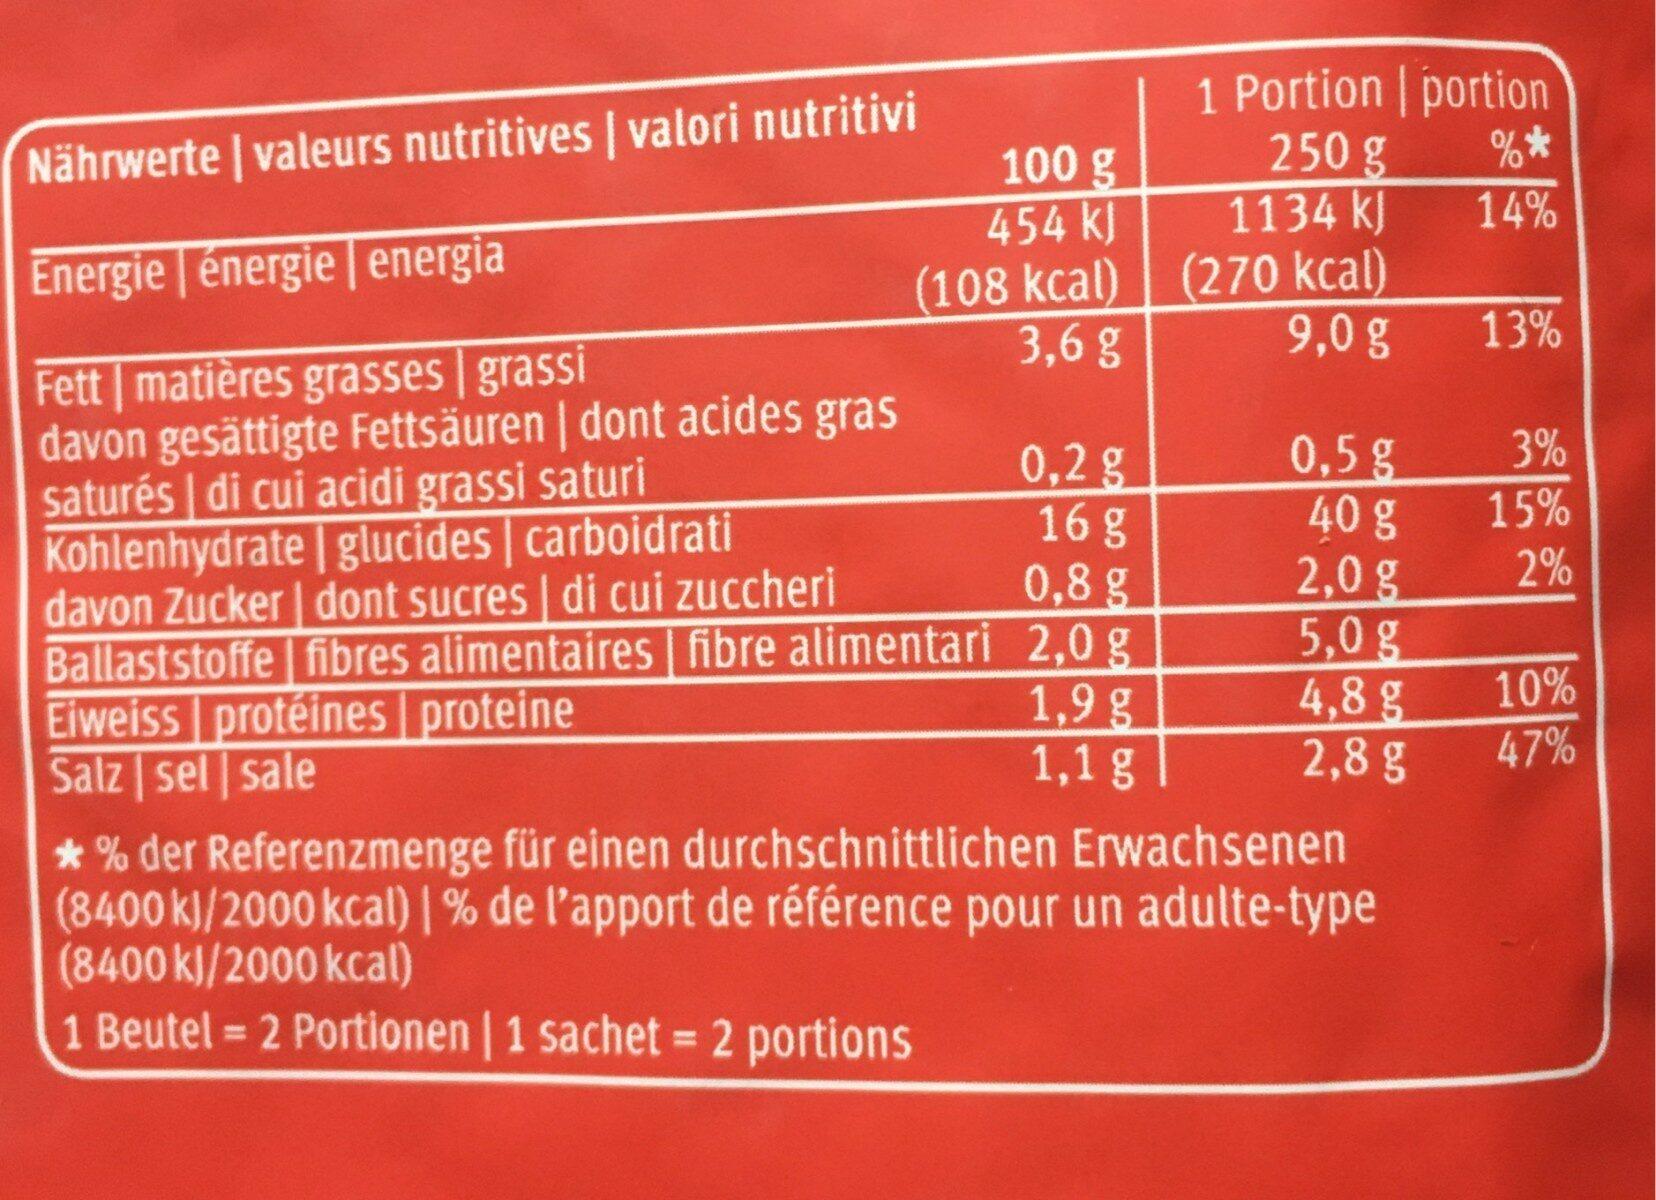 Farm rösti original - Valori nutrizionali - fr